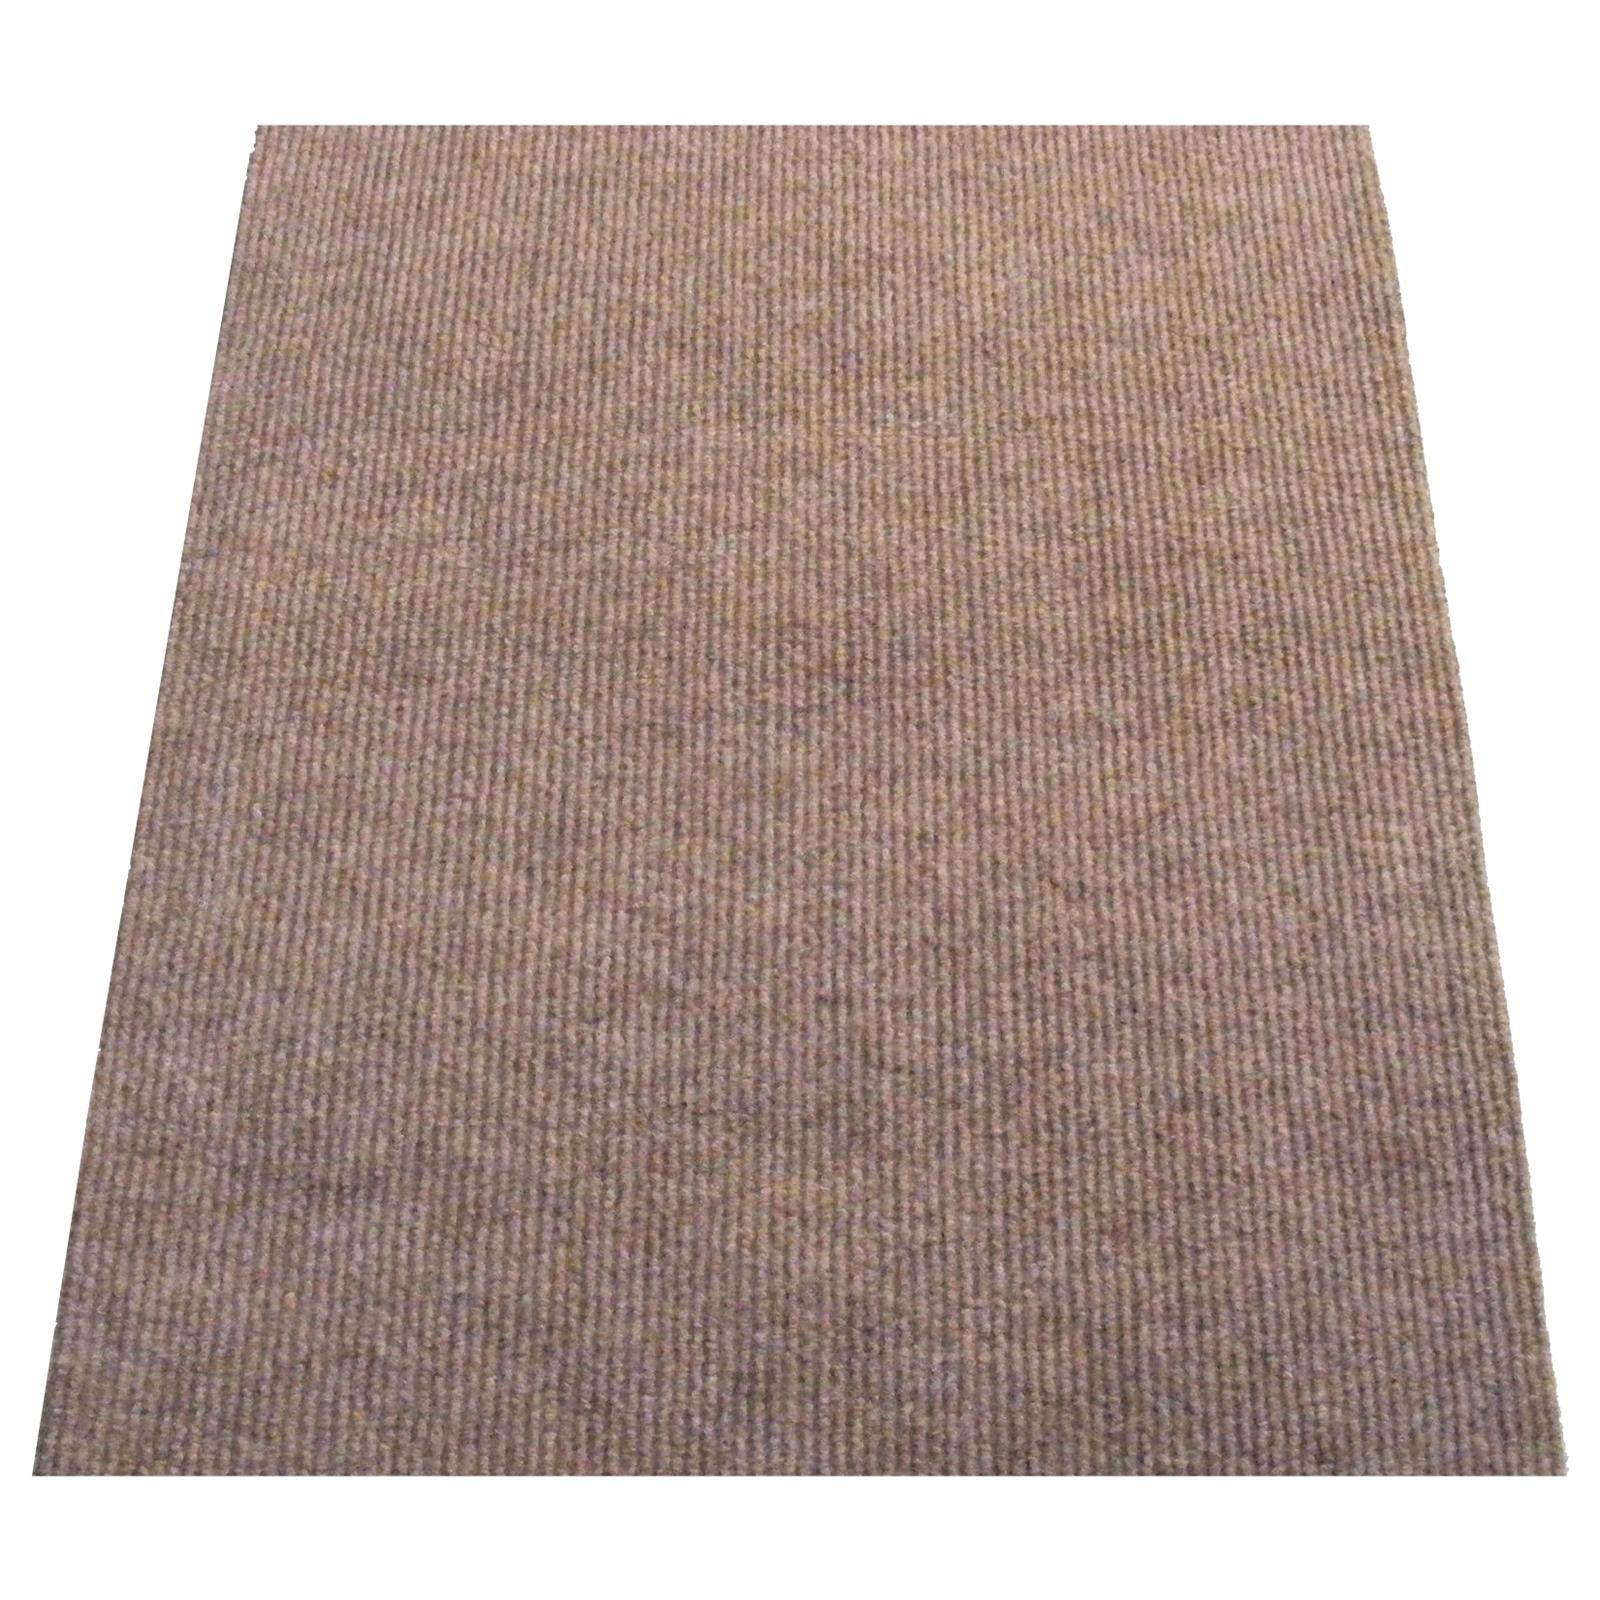 Ideal DIY 67cm Beige Oxford Ribbed Carpet Runner - Linear Metre